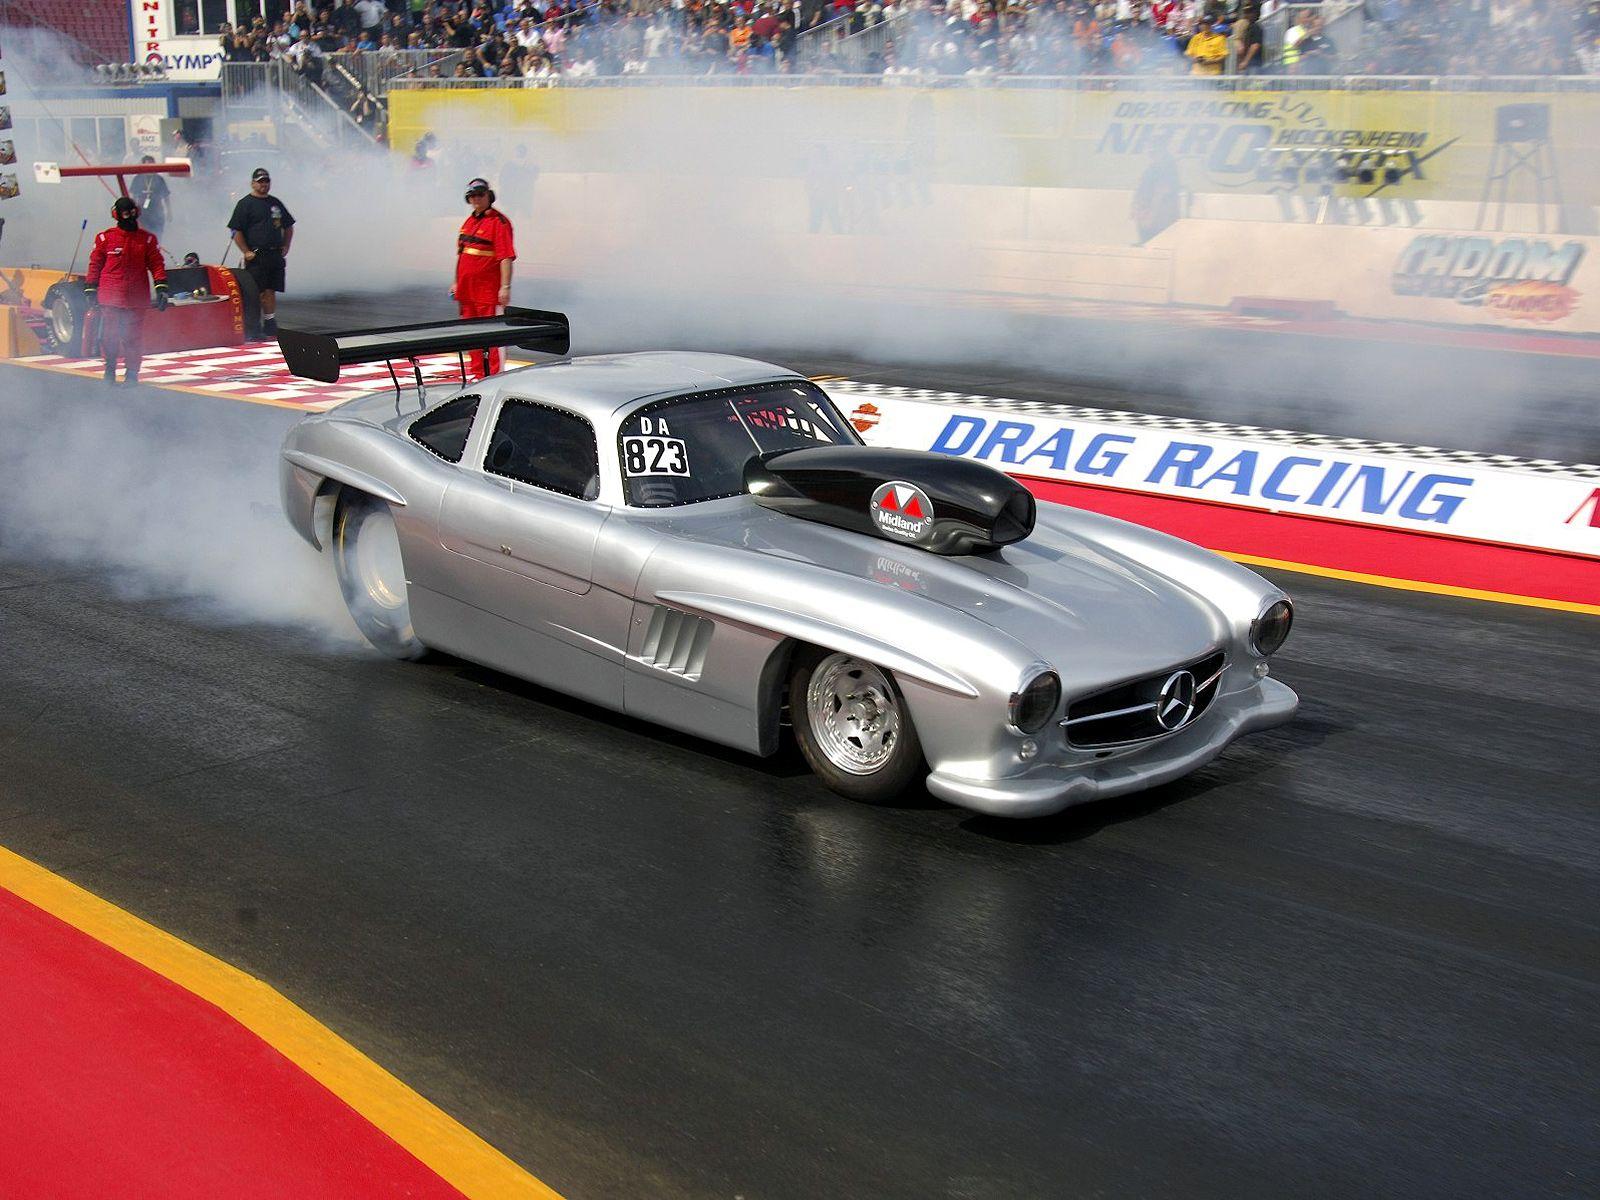 Mercedes benz 300sl gullwing drag race edition benztuning for Mercedes benz race cars